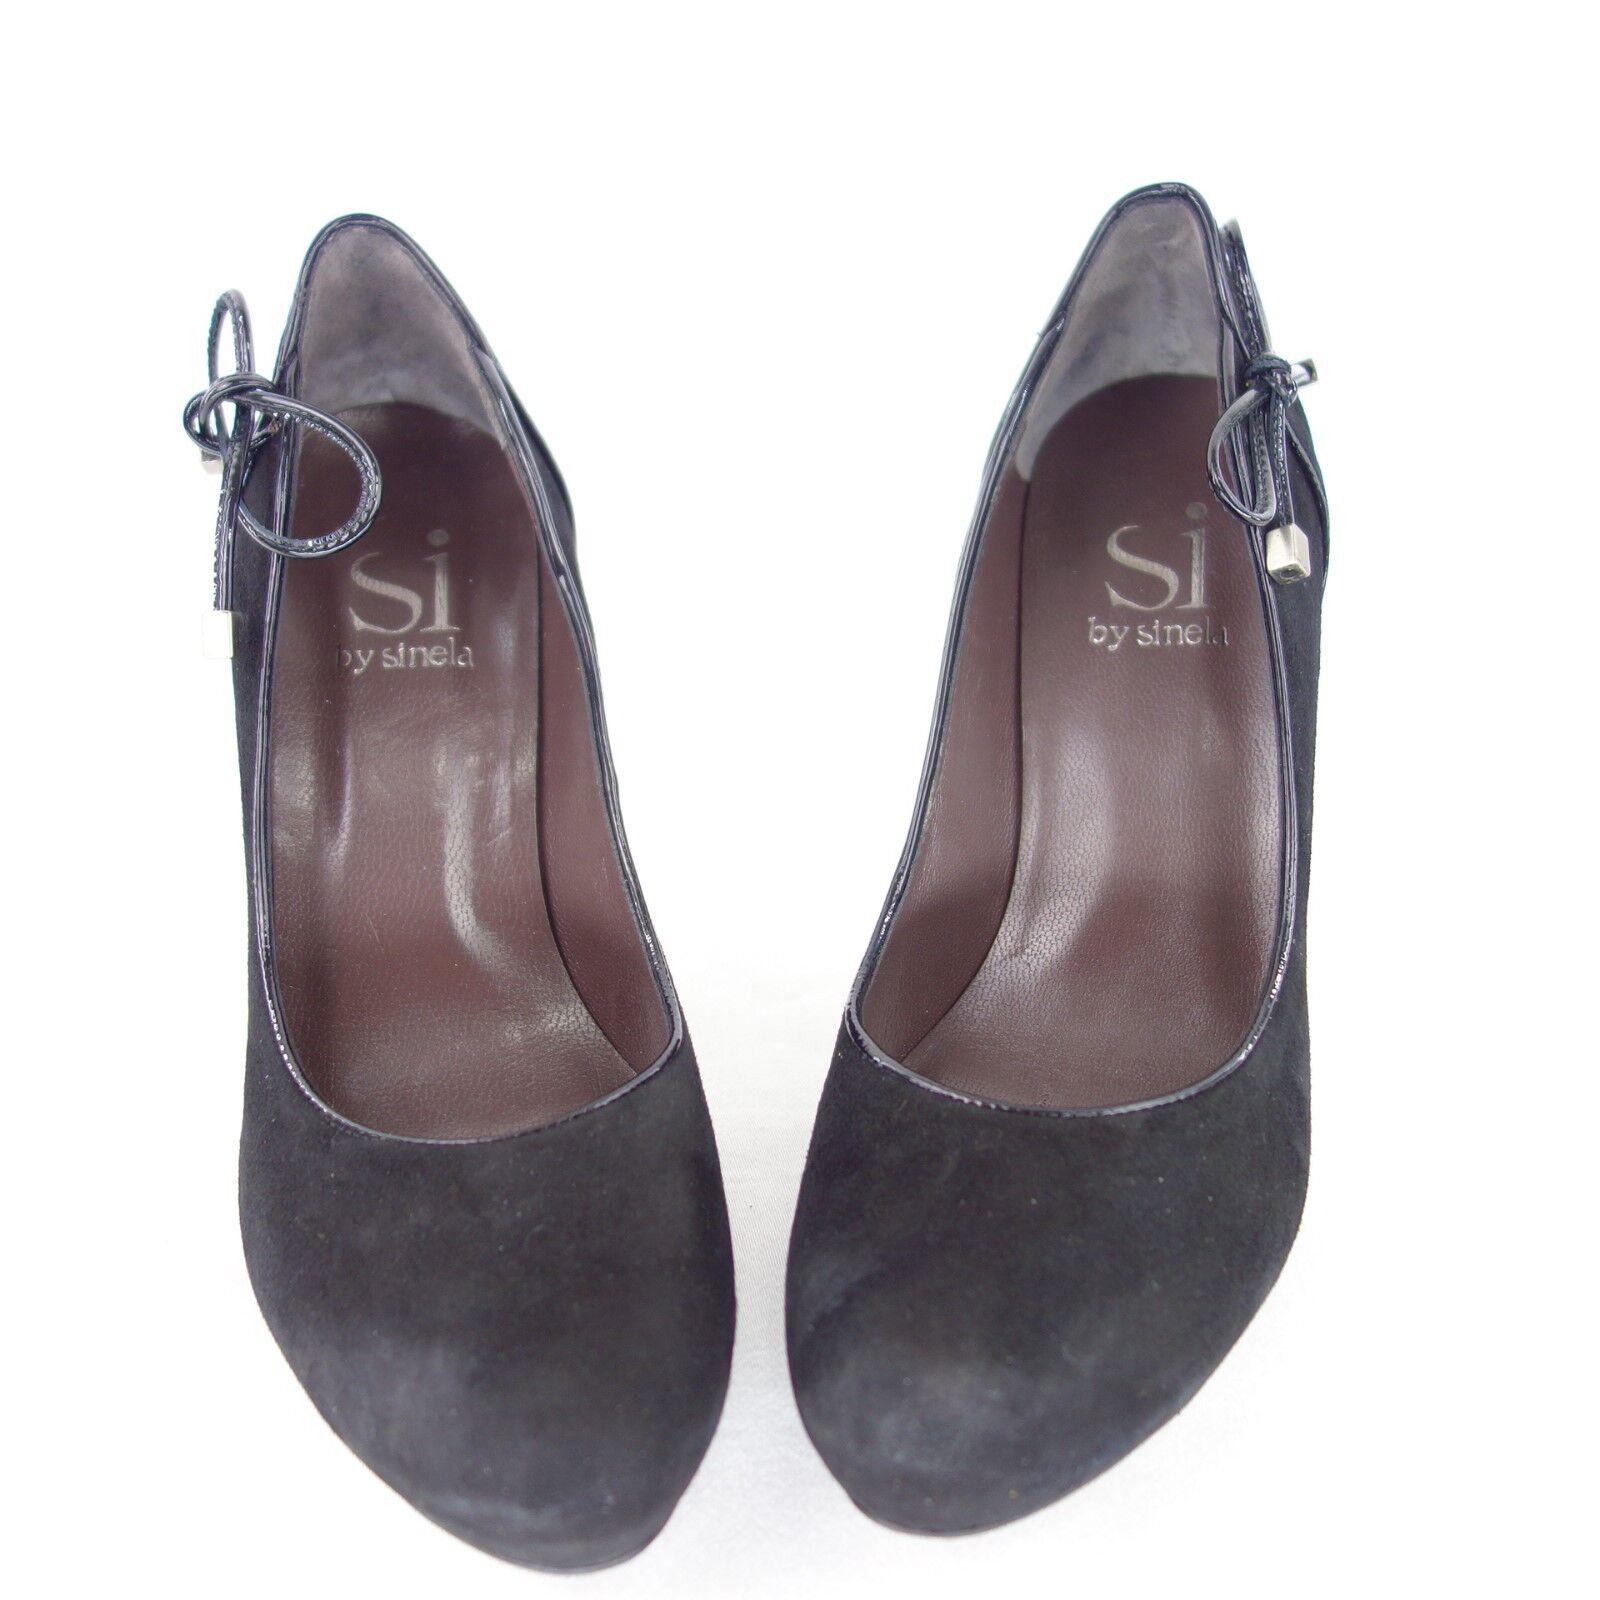 Si by Sinela Women's Court shoes Leather Suede Black Black Black Bix 41 Np 139 924447